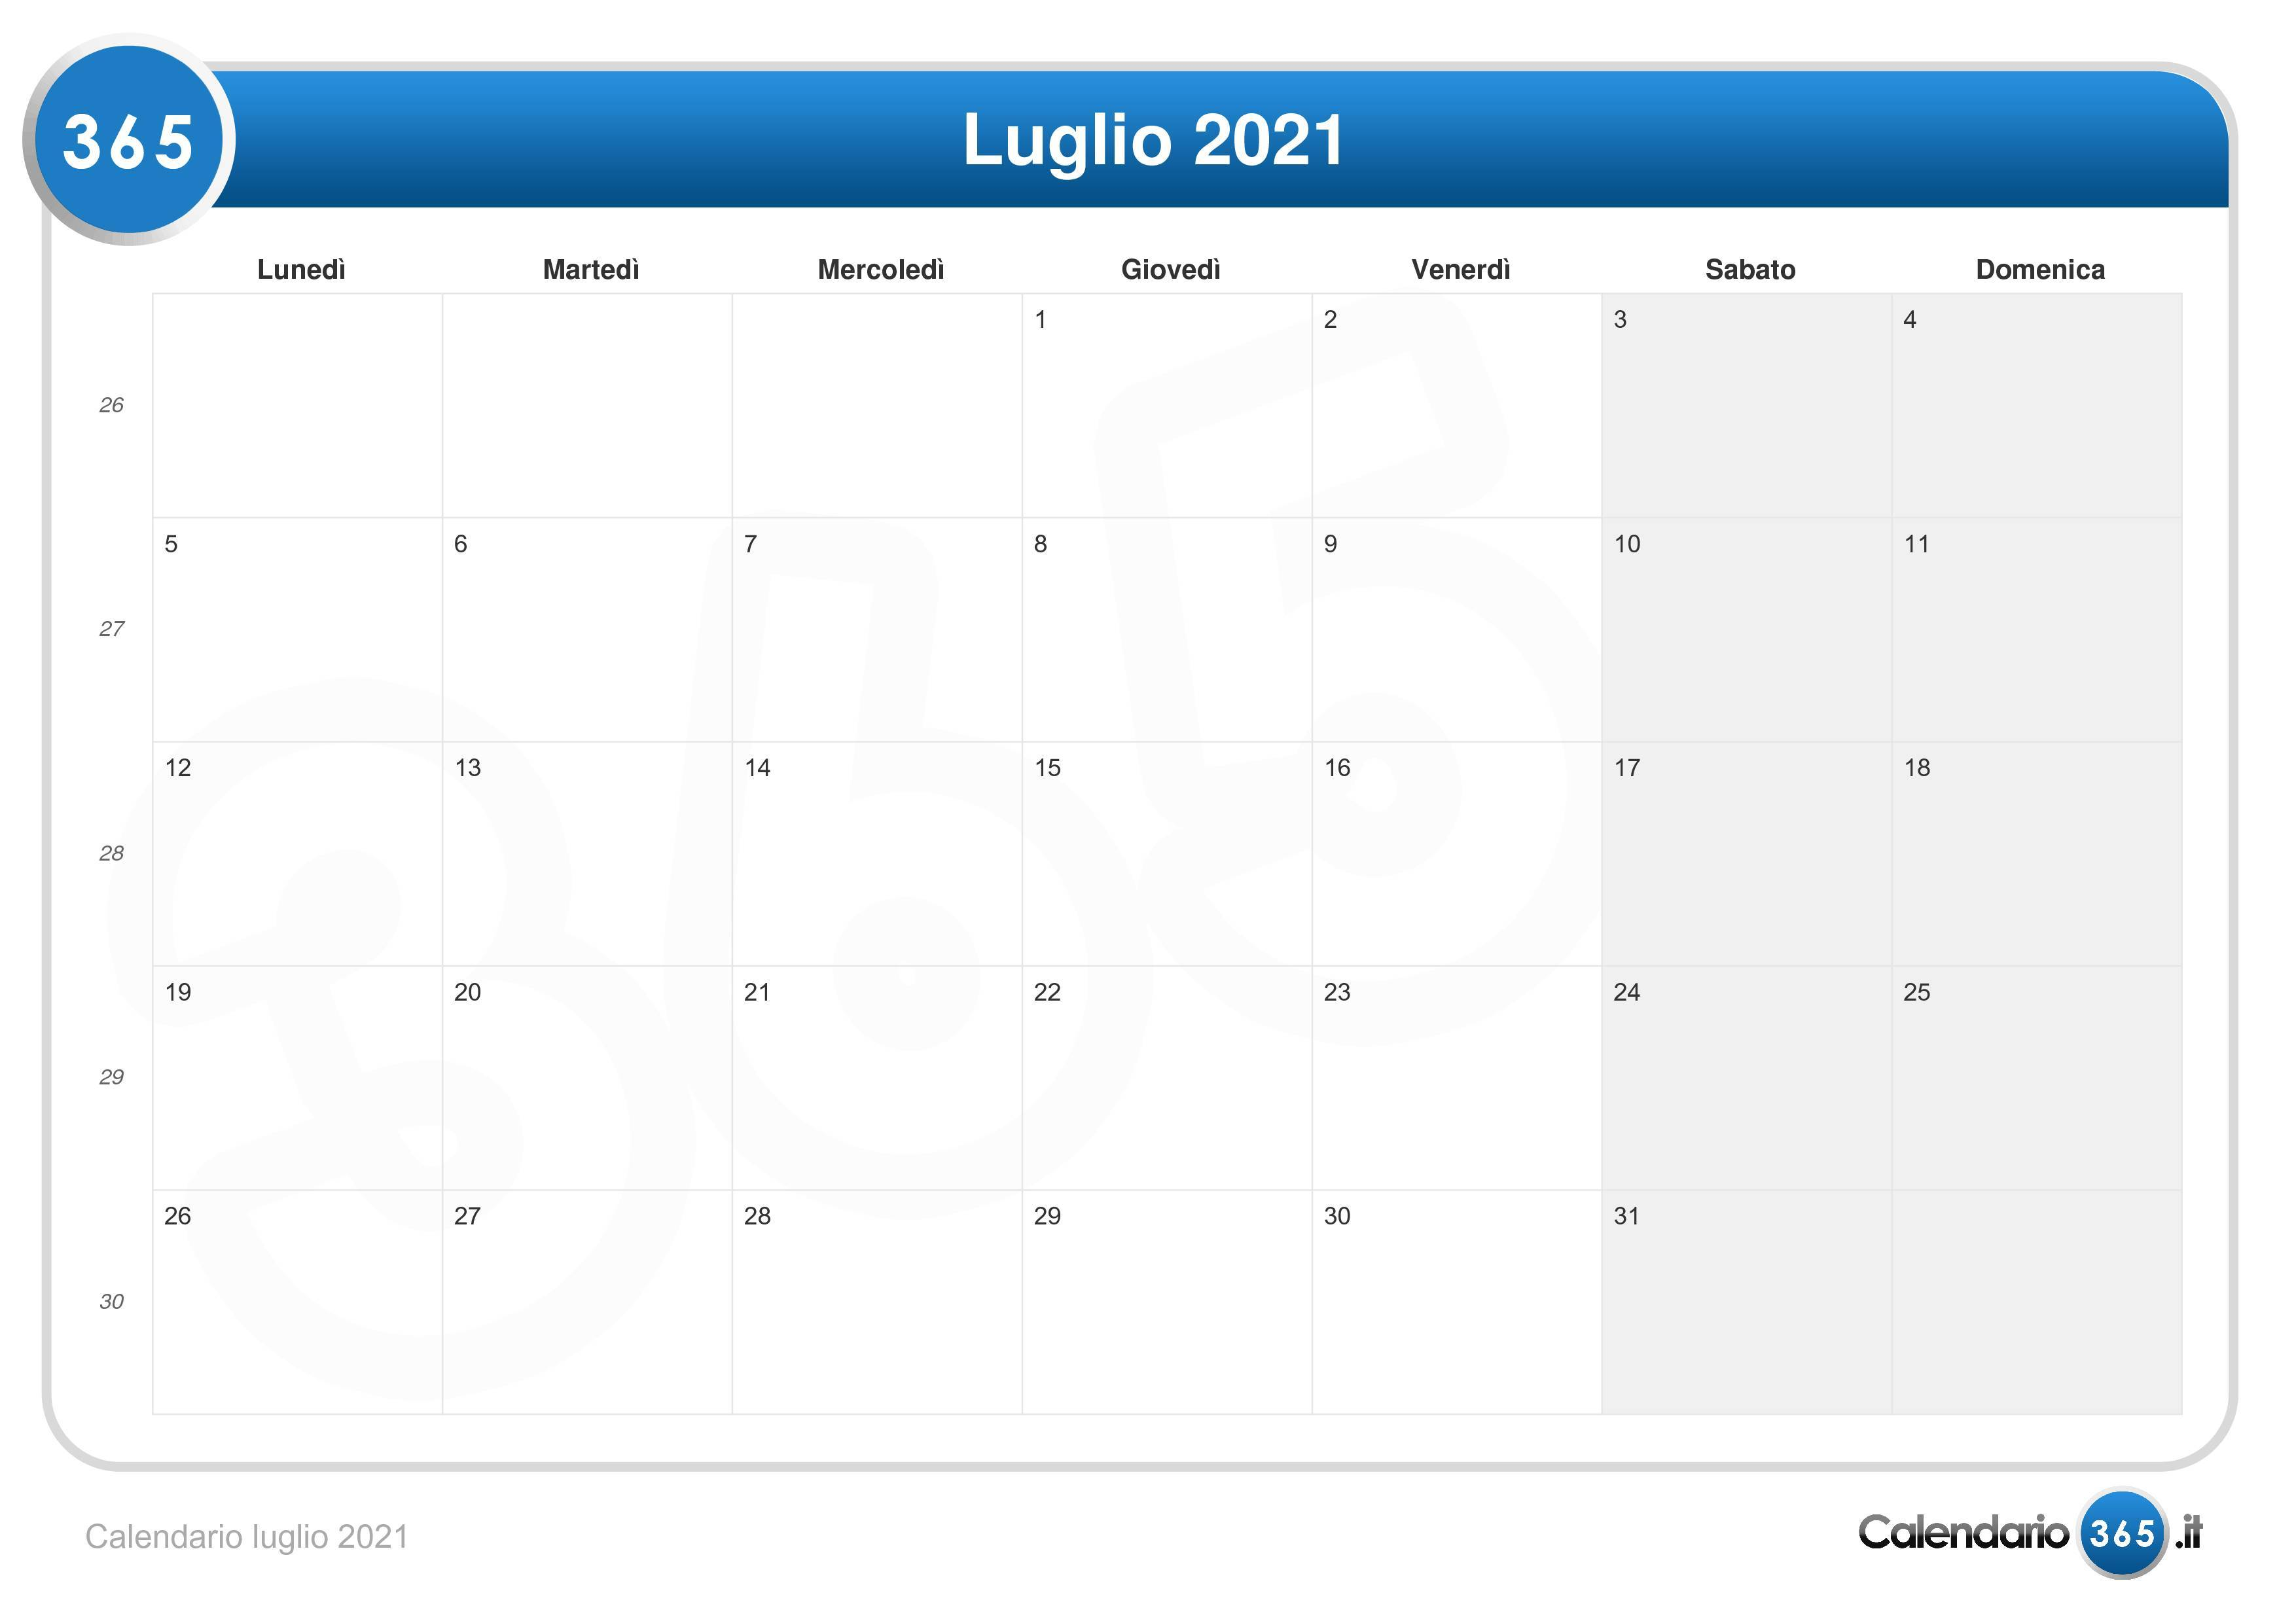 Calendario luglio 2021